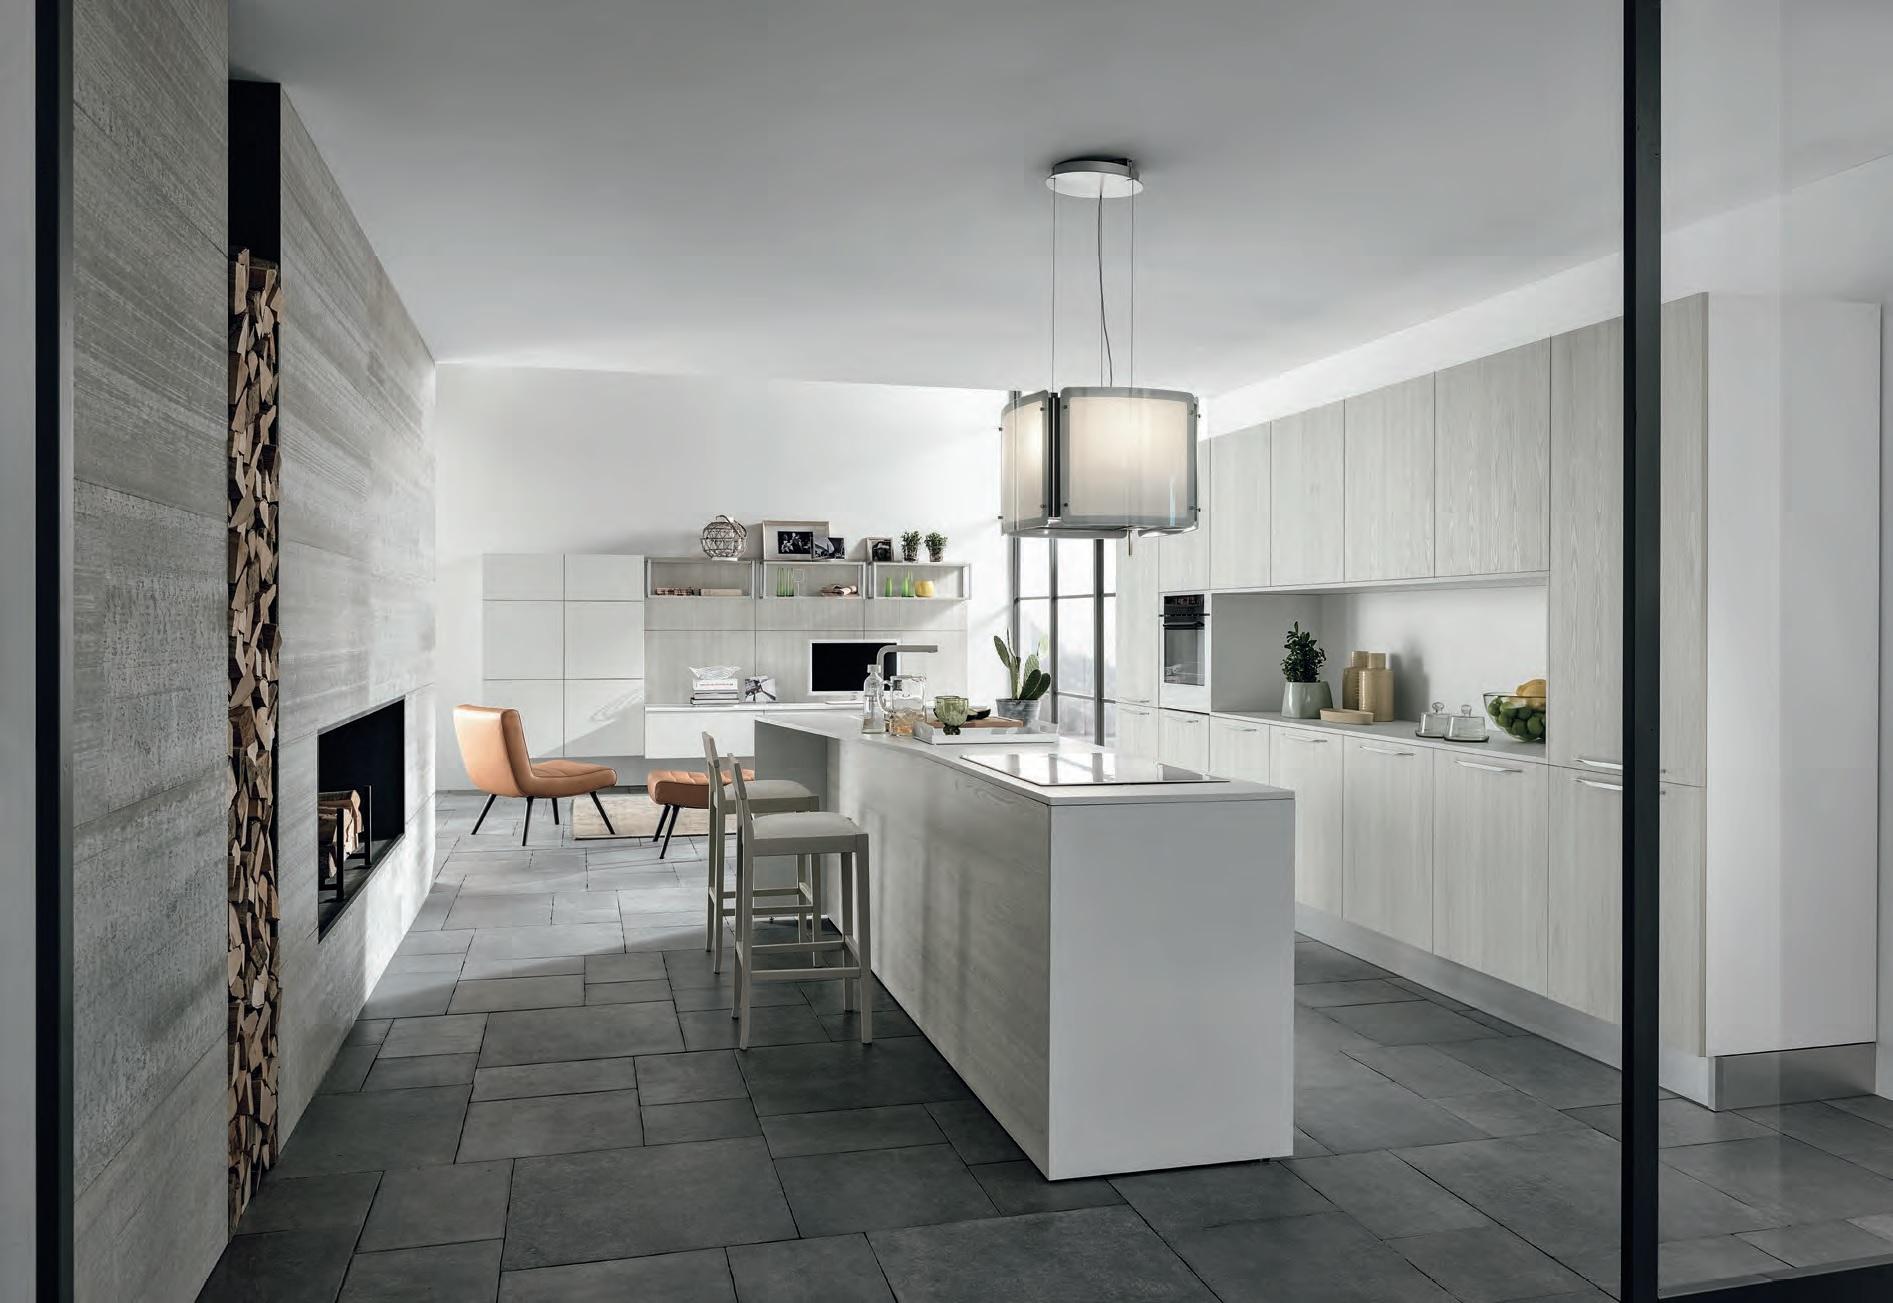 La cucina moderna riganelli arredamenti - La cucina moderna ...